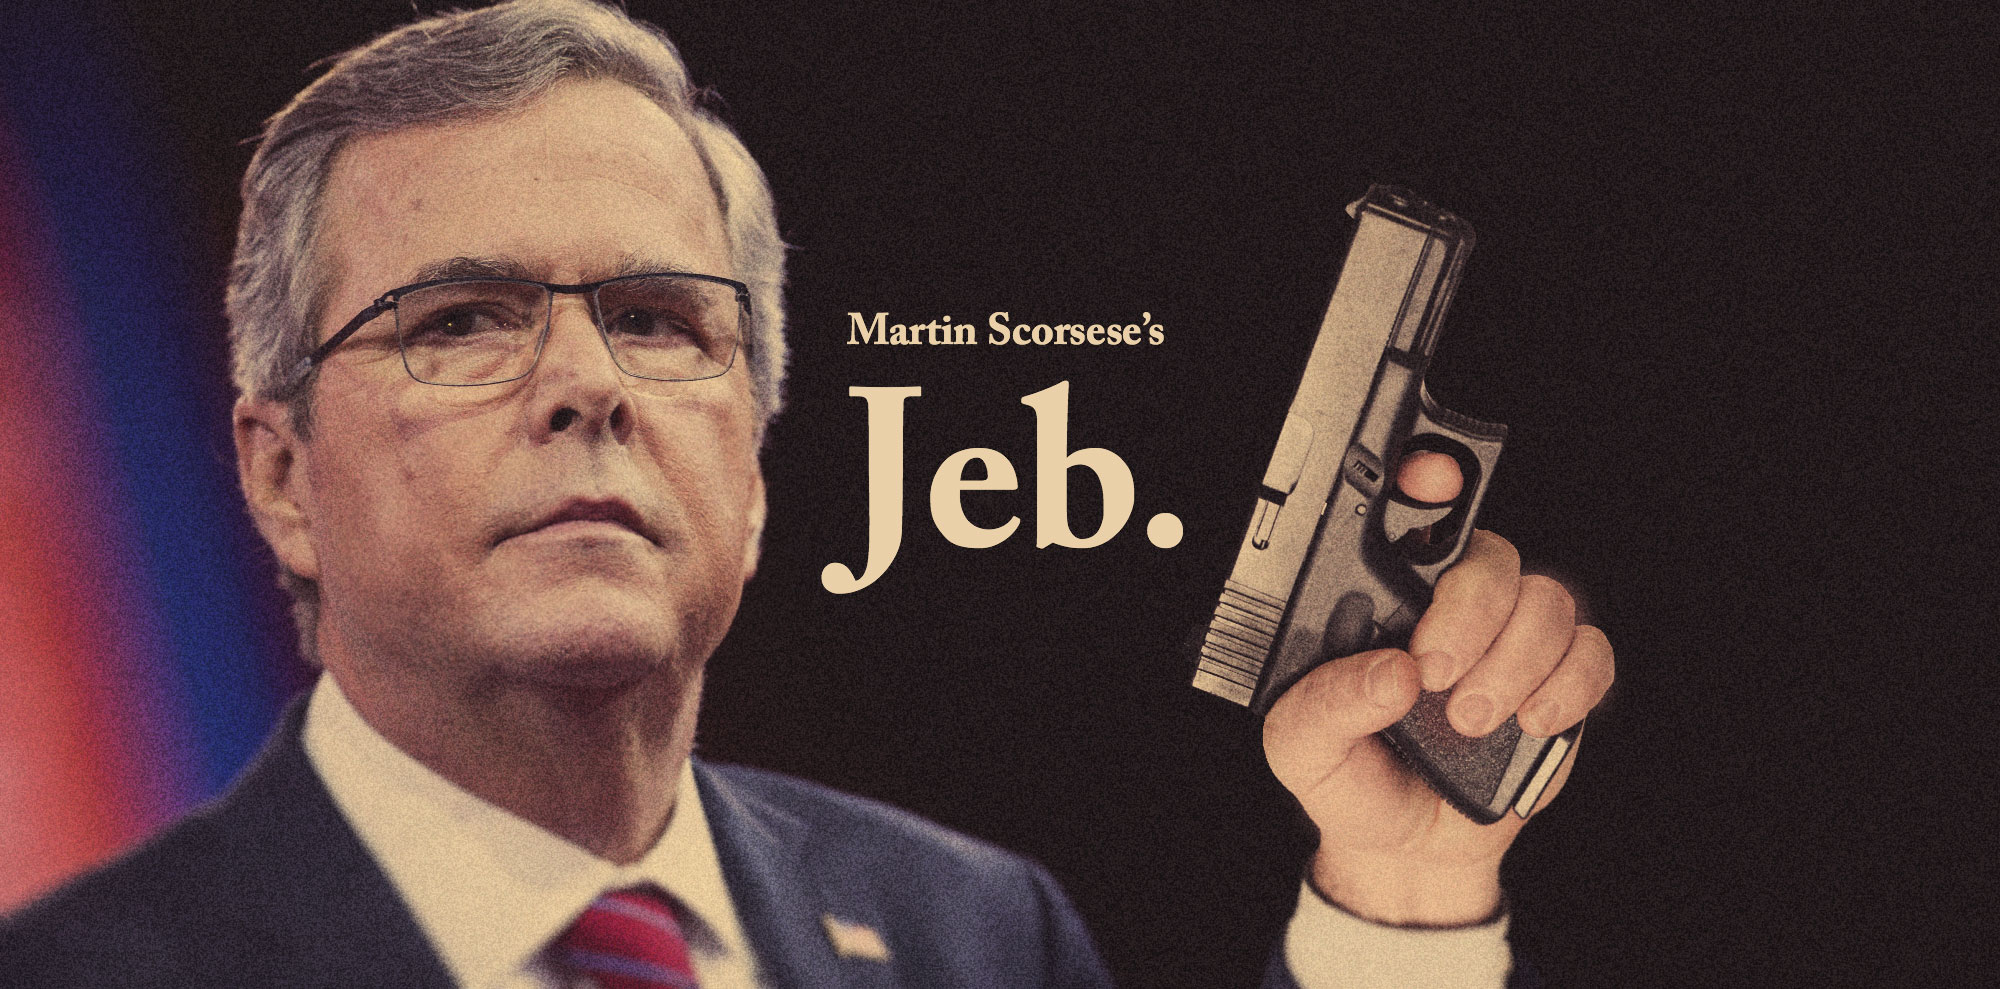 Martin Scorsese's Jeb. / Boing Boing